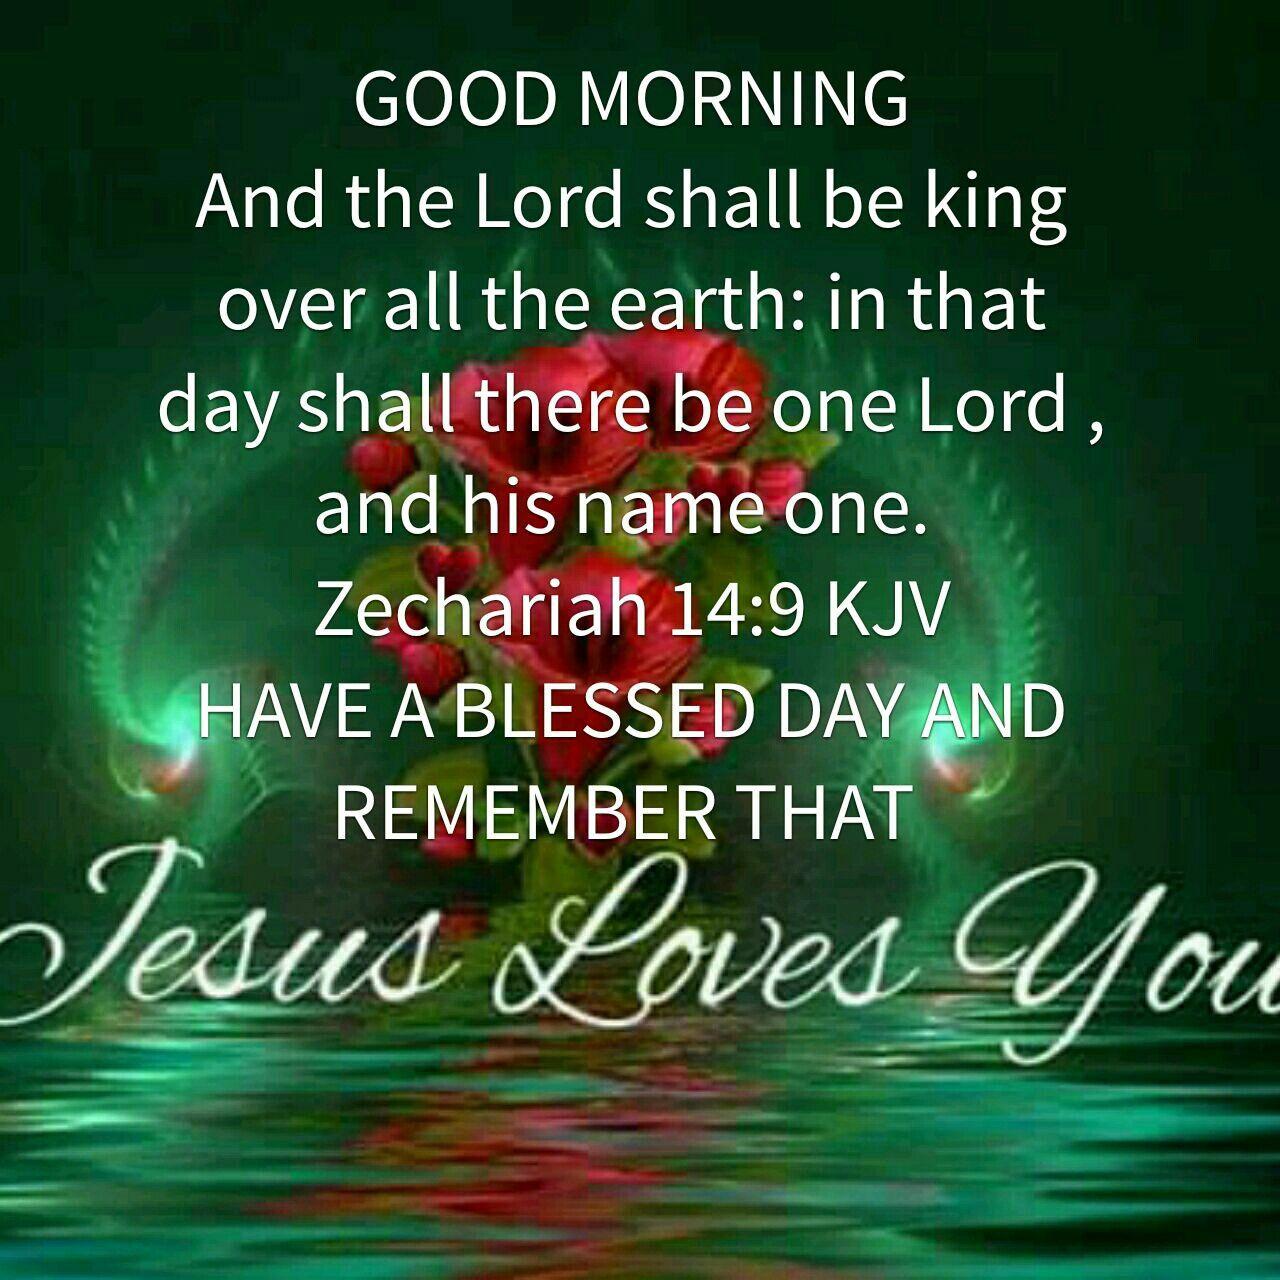 Pin By Louise Pereira On Attitude Good Morning Quotes Morning Greetings Quotes Good Morning Messages